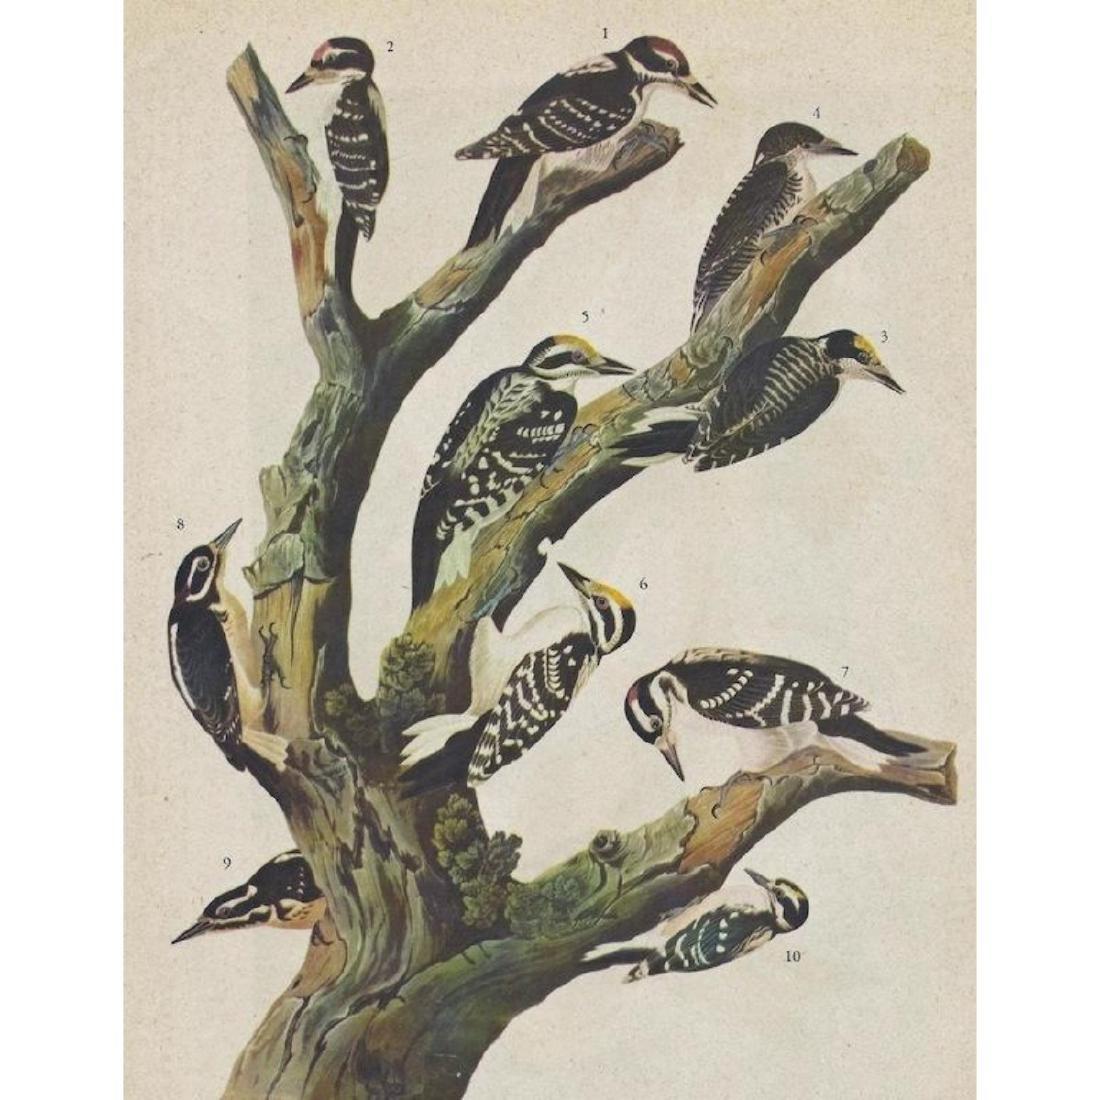 c1946 Audubon Print, Two Woodpeckers